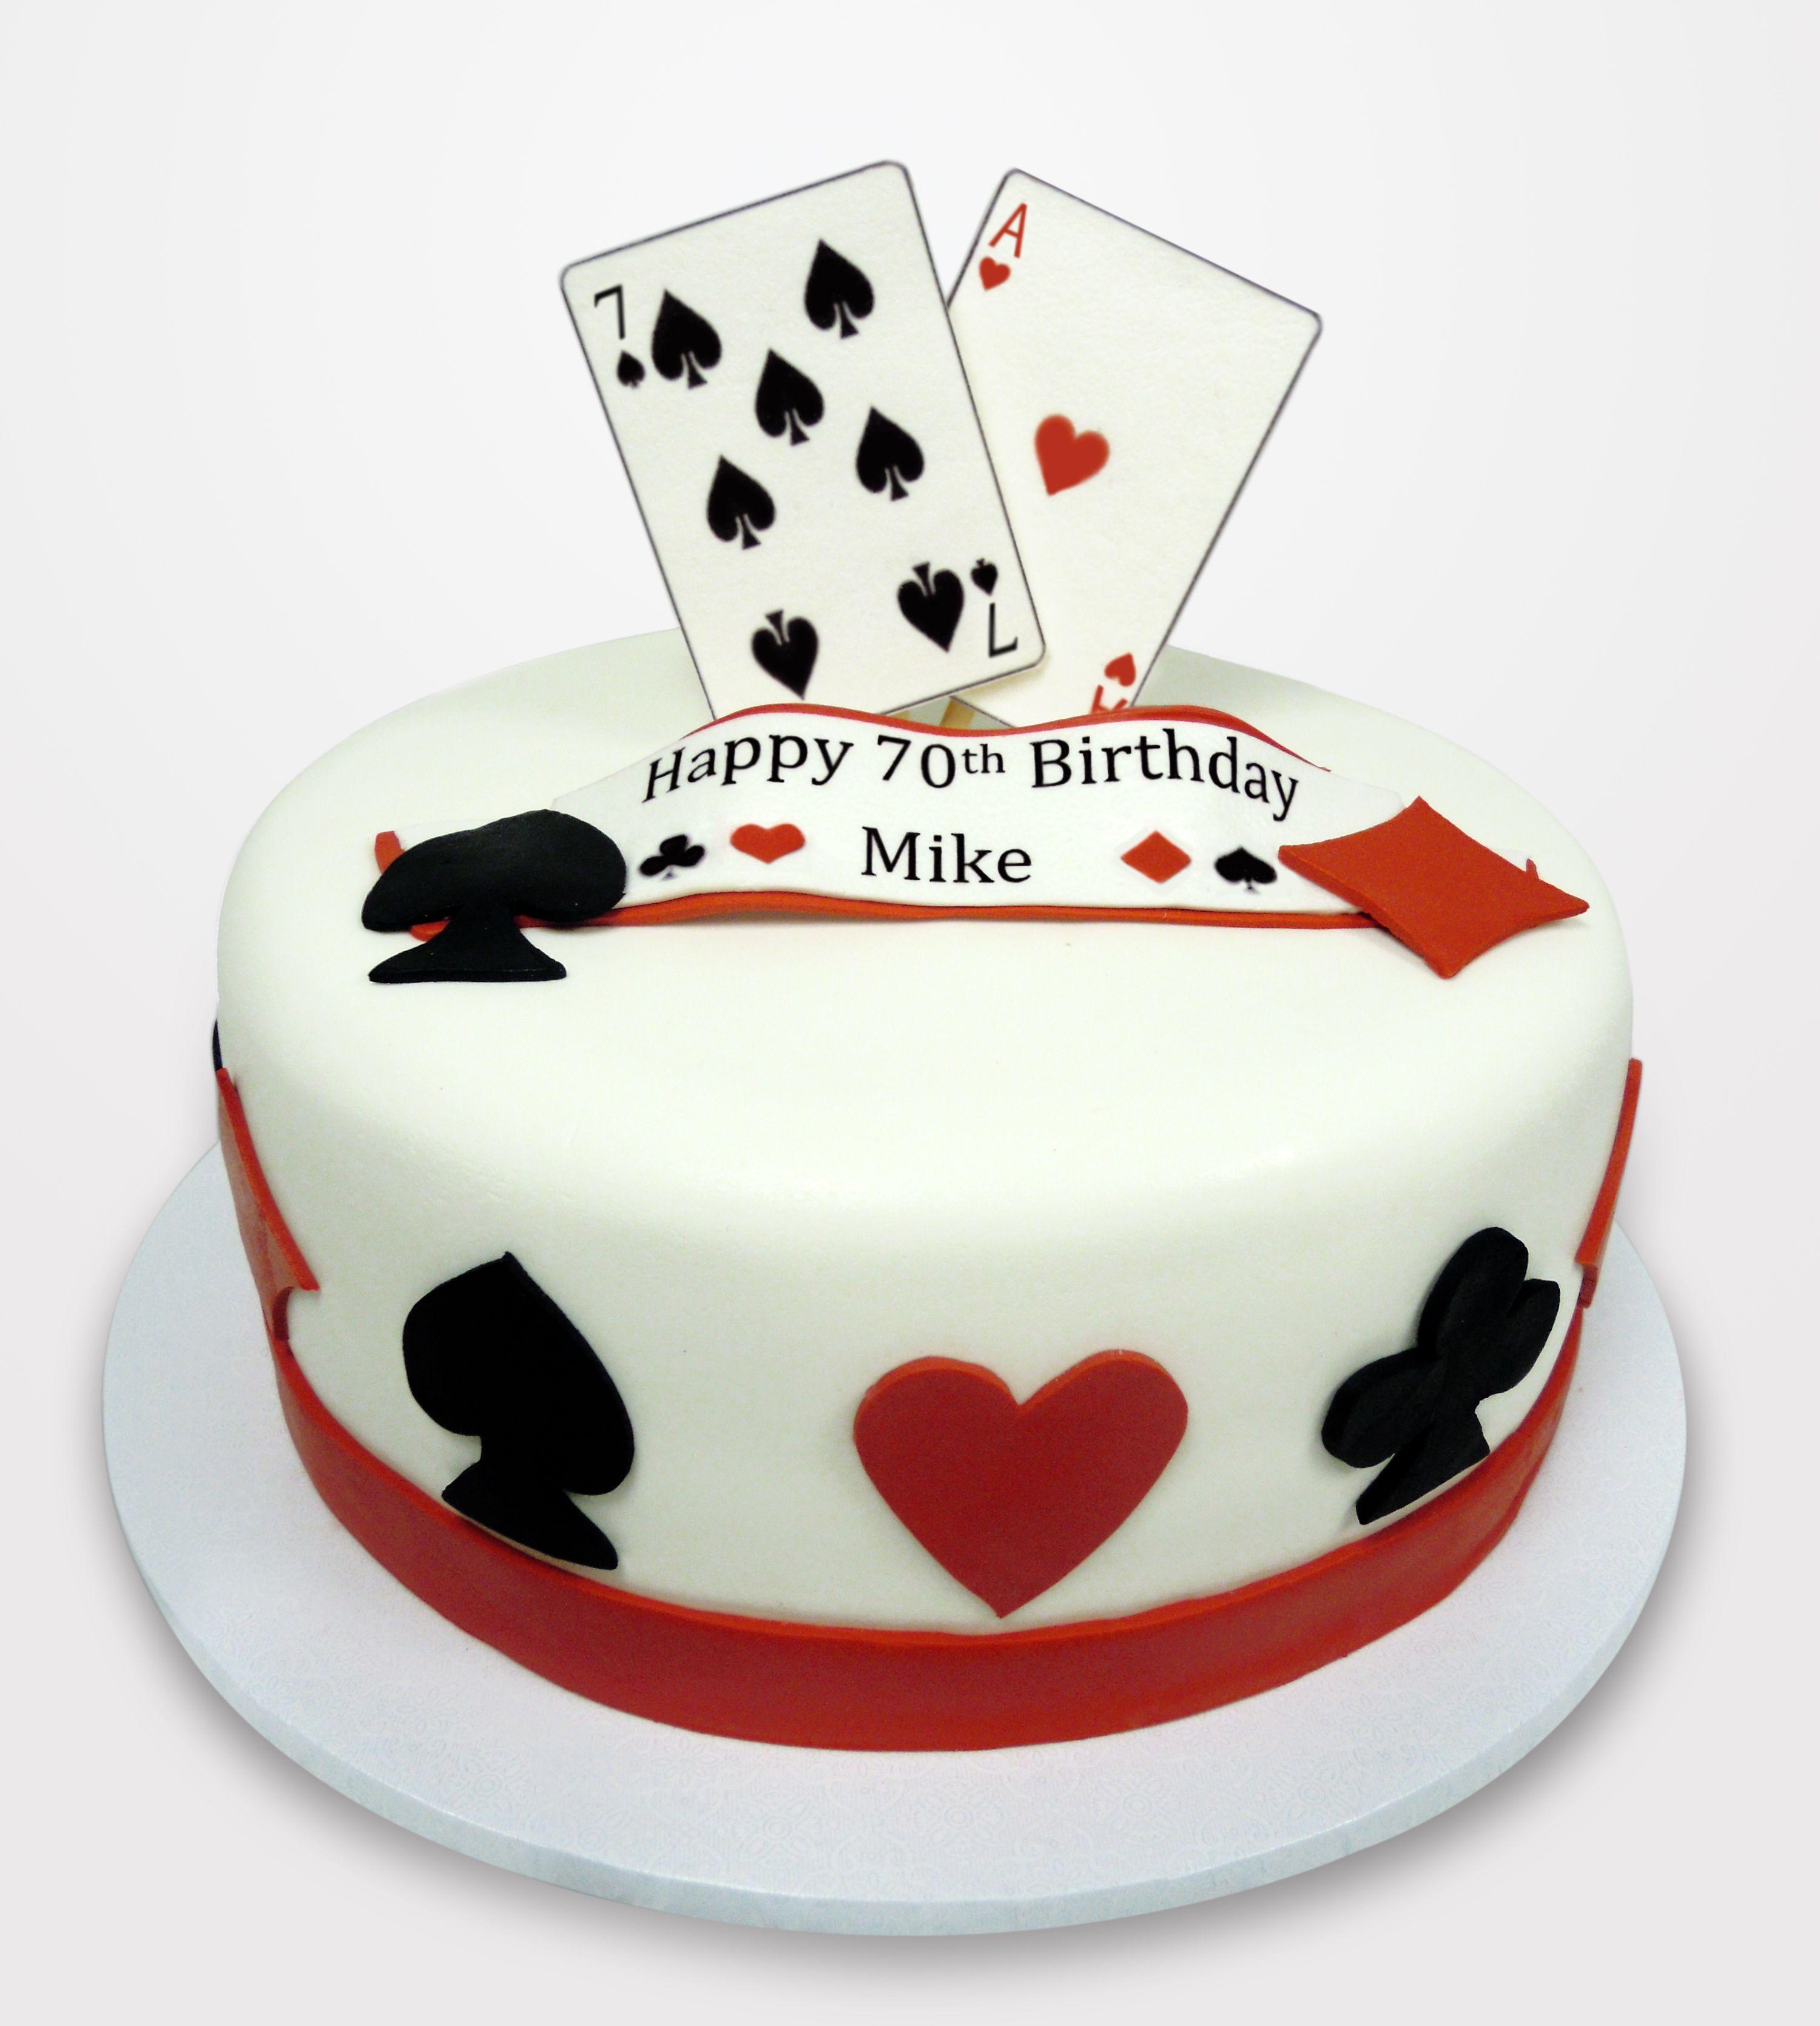 Playing Card Birthday Cake  Birthday Cakes    Card